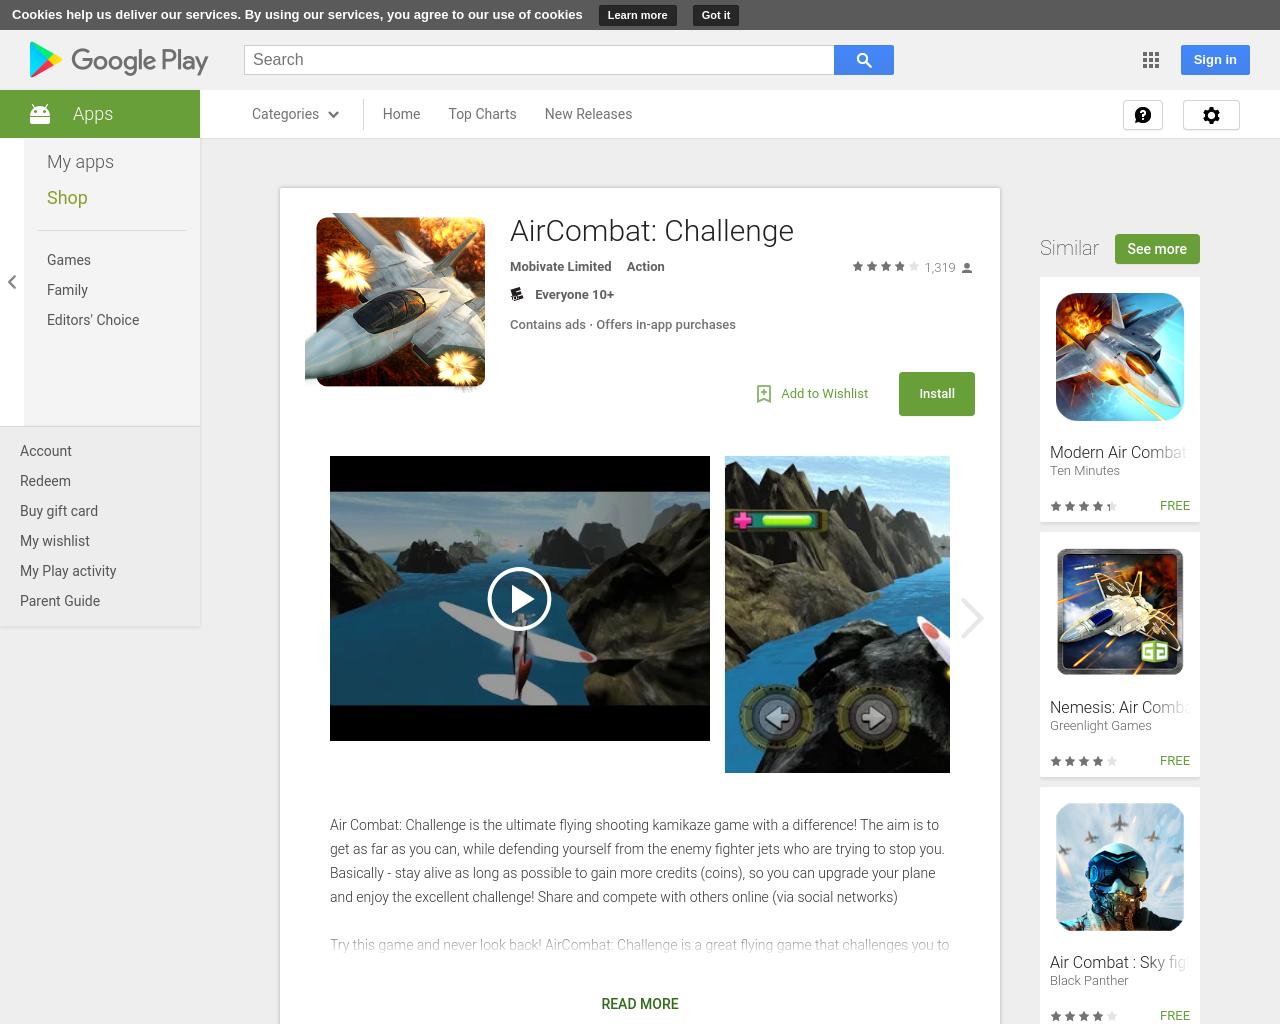 AirCombat: Challenge